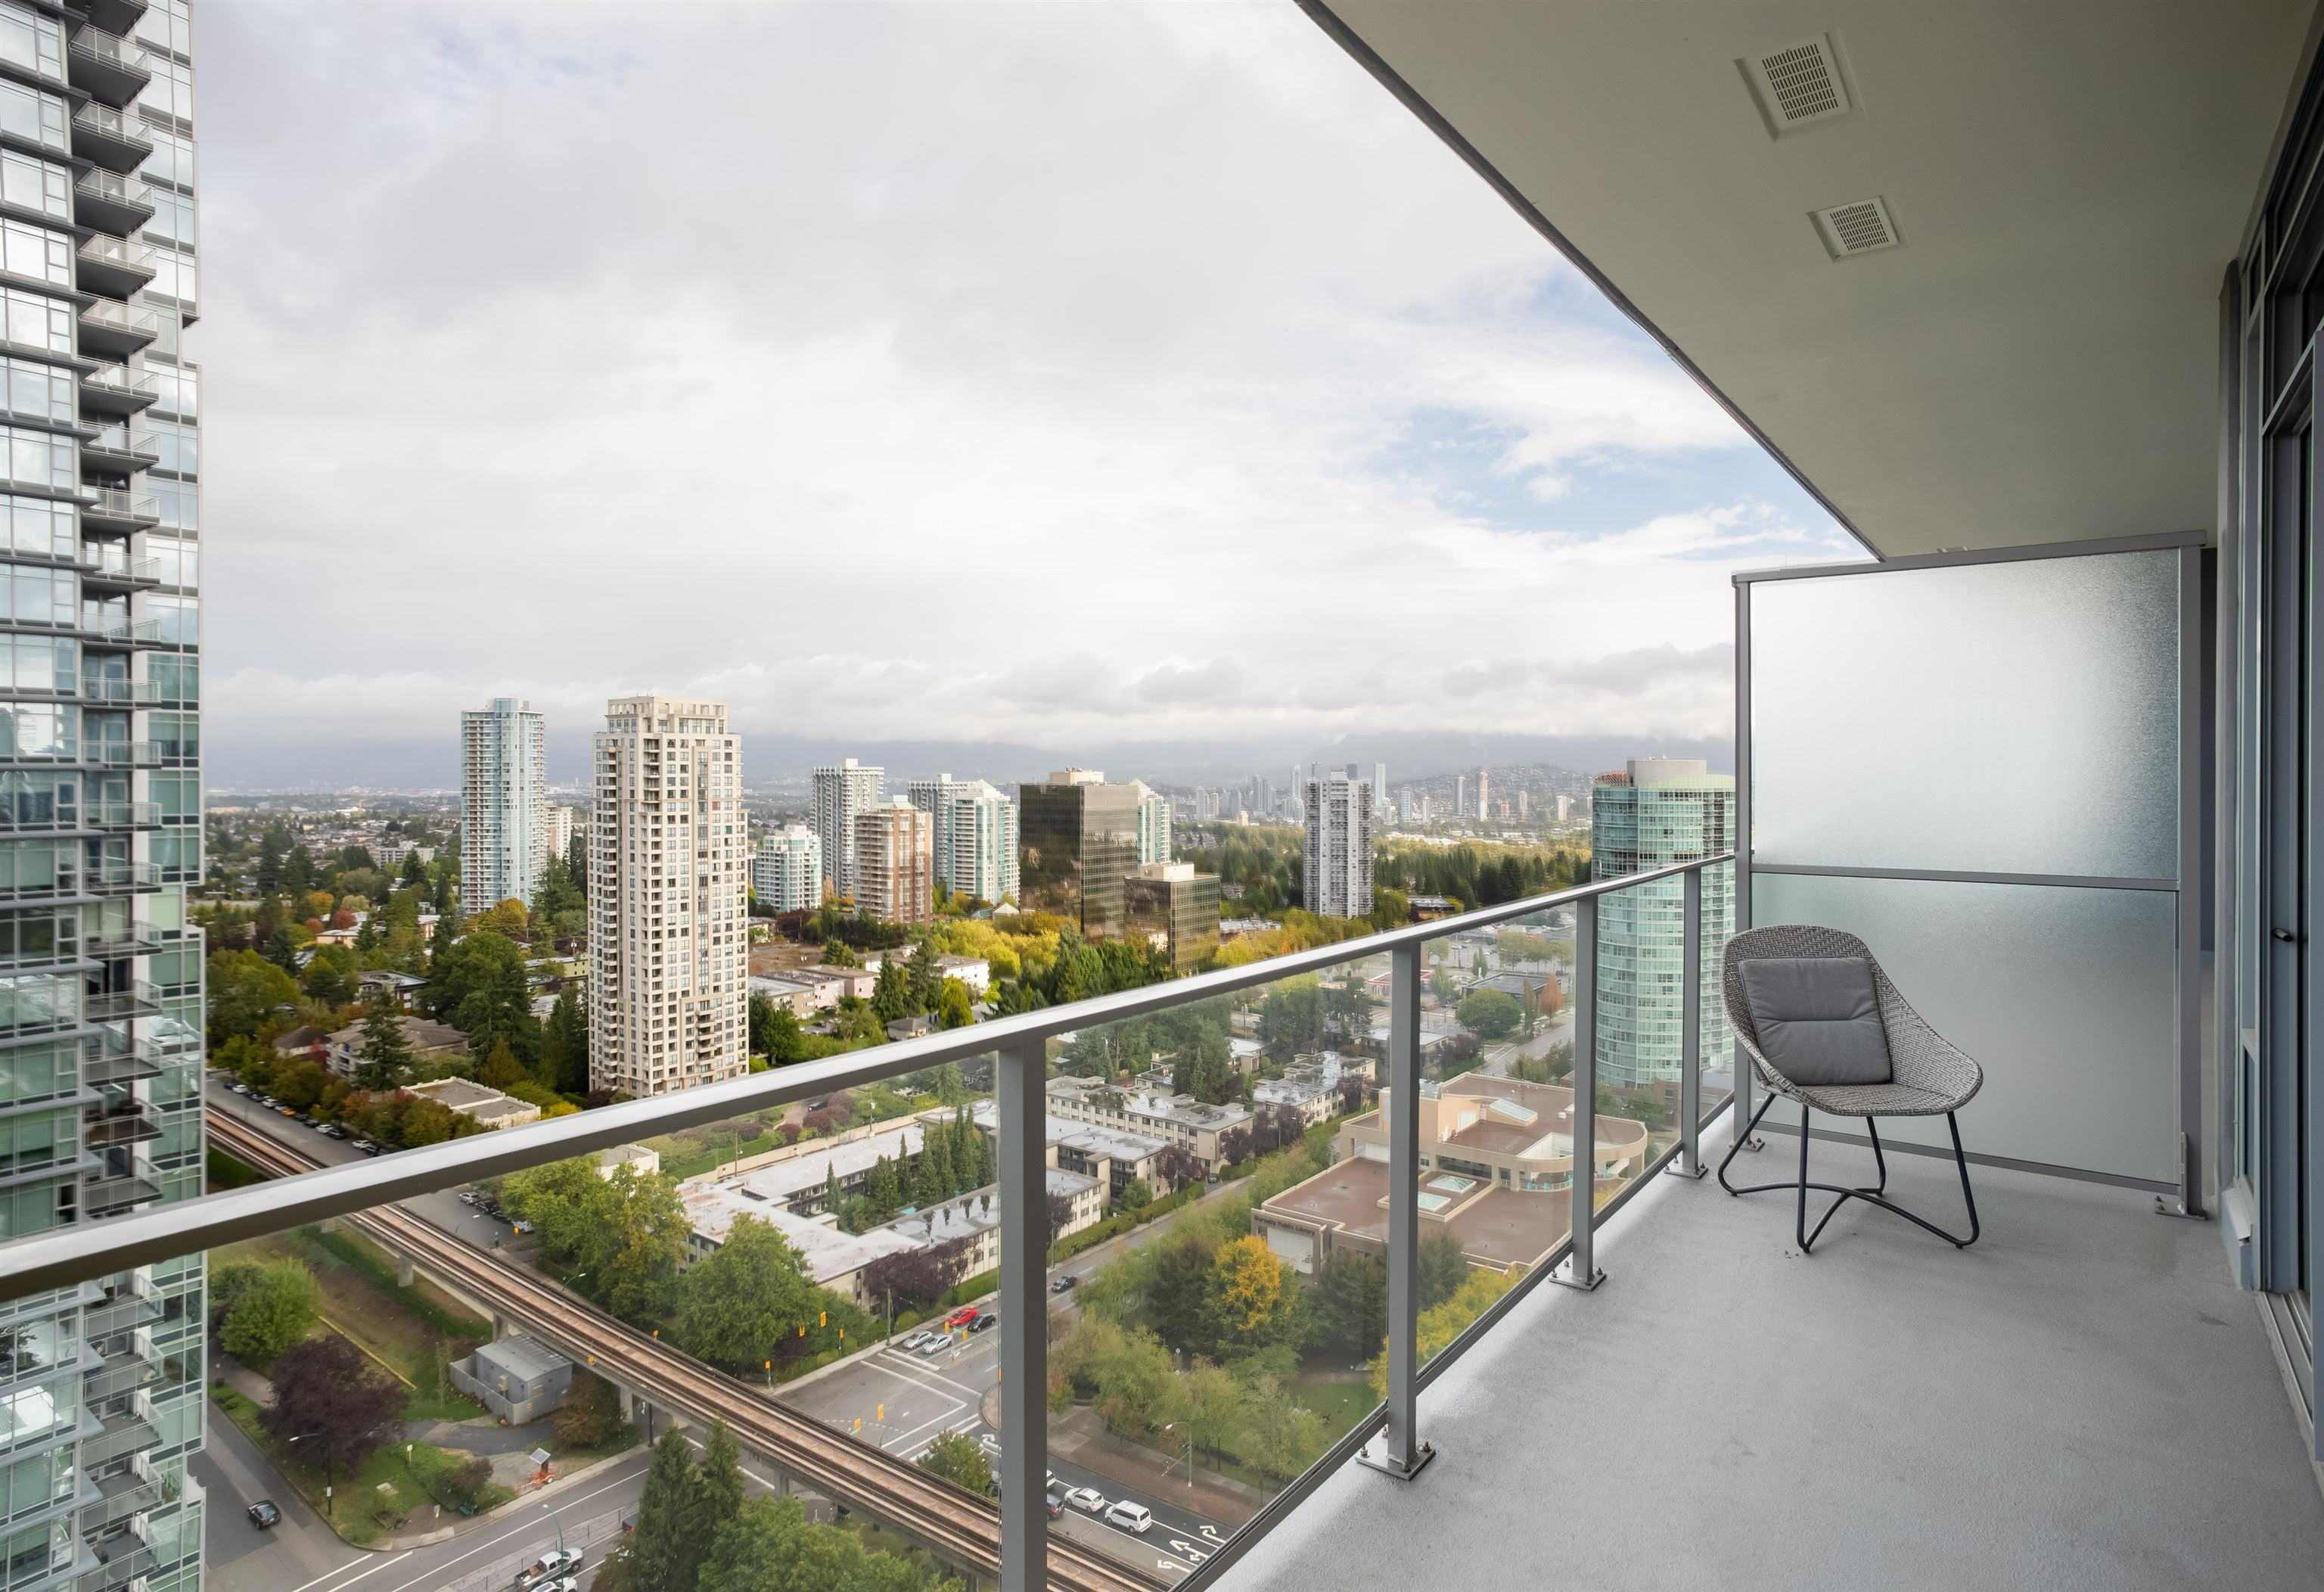 2206 6383 MCKAY AVENUE - Metrotown Apartment/Condo for sale, 2 Bedrooms (R2625647) - #25